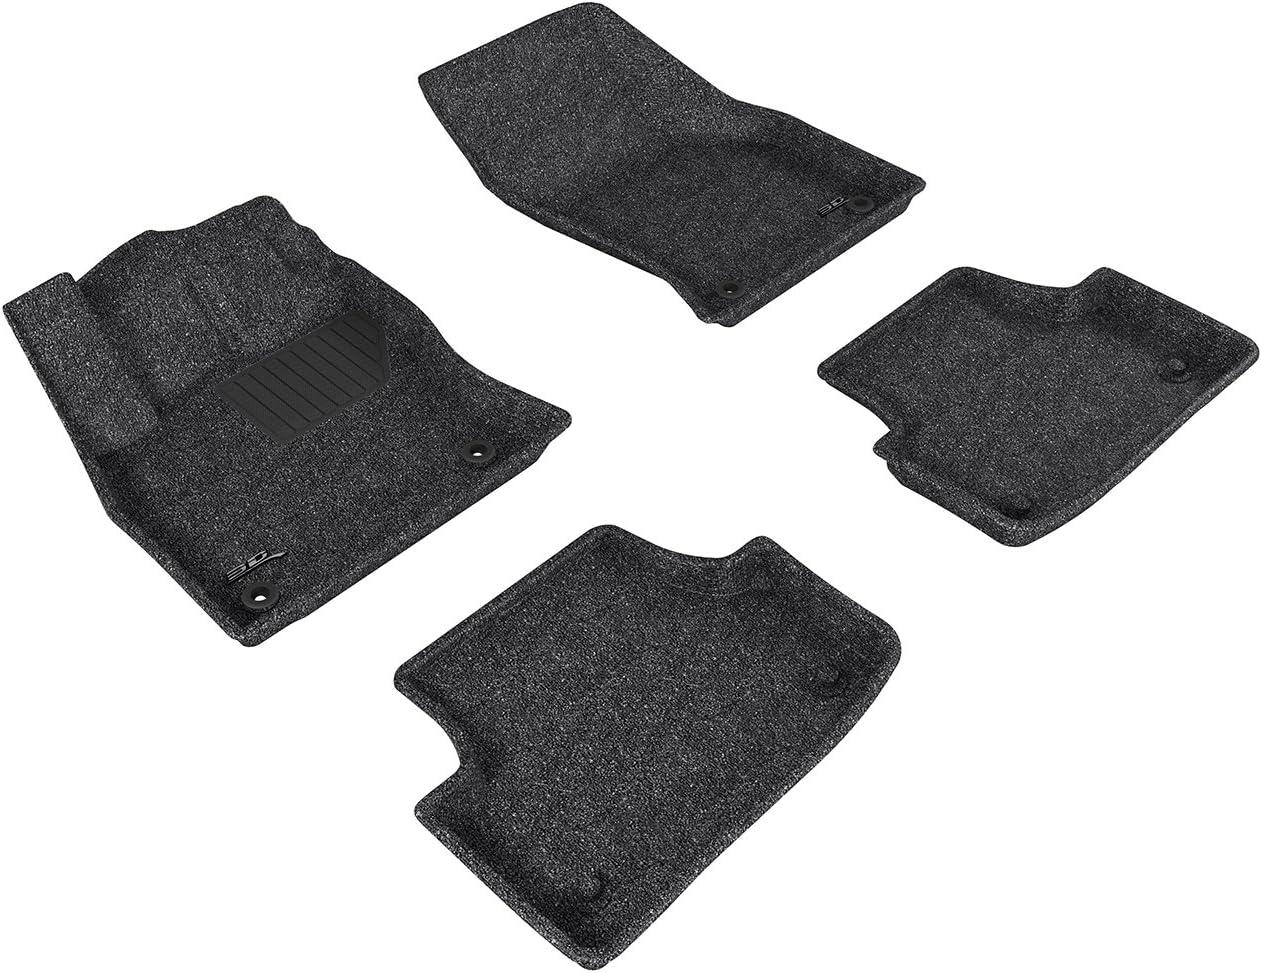 3D MAXpider Second Row Custom Fit All-Weather Floor Mat for Select Audi A3//S3 Models Classic Carpet Black